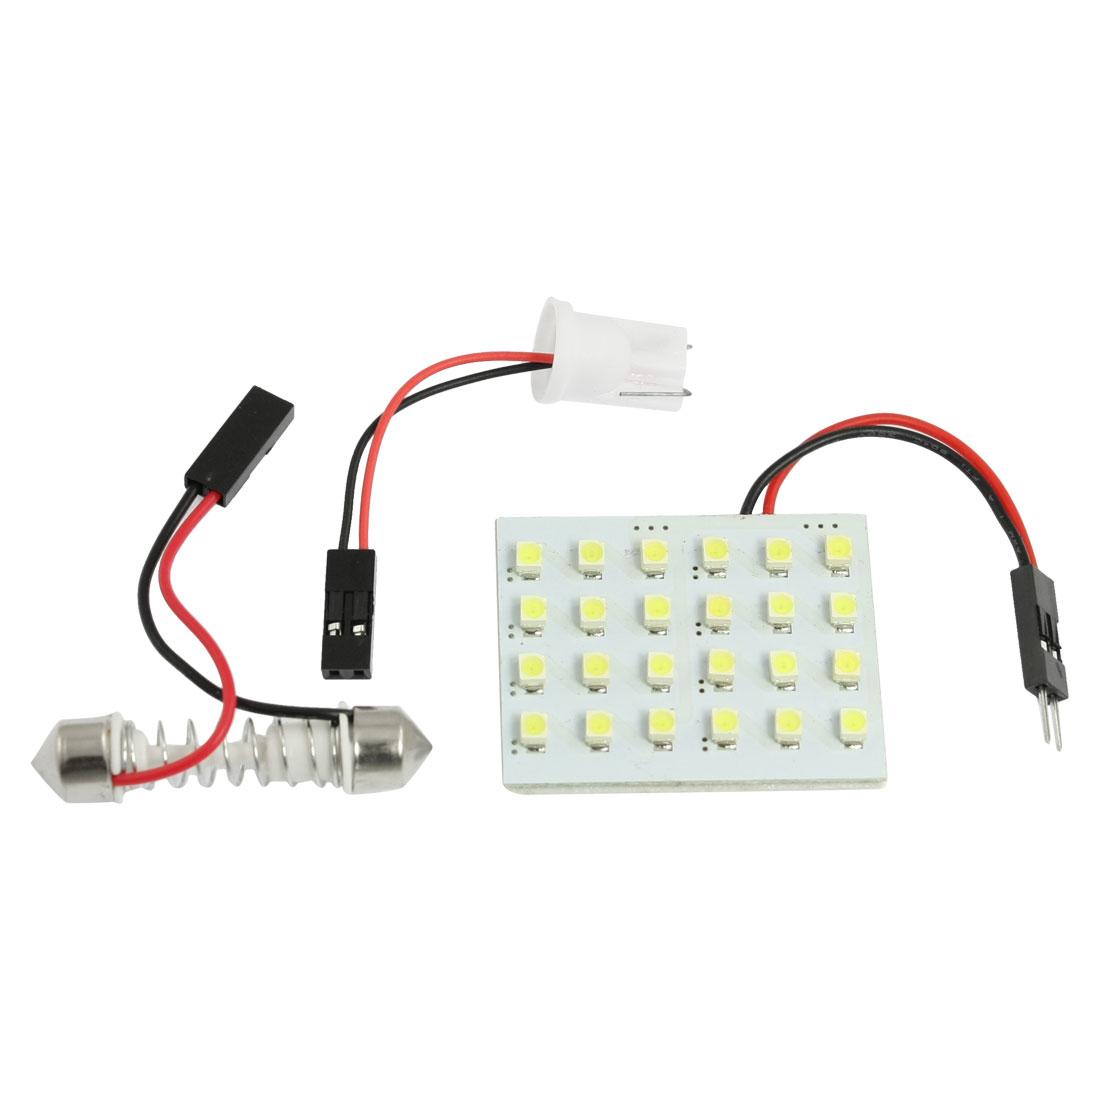 Auto Car 24 1206 SMD White LED Light Bulb Lamp Panel T10 Festoon Box Dome Bulb